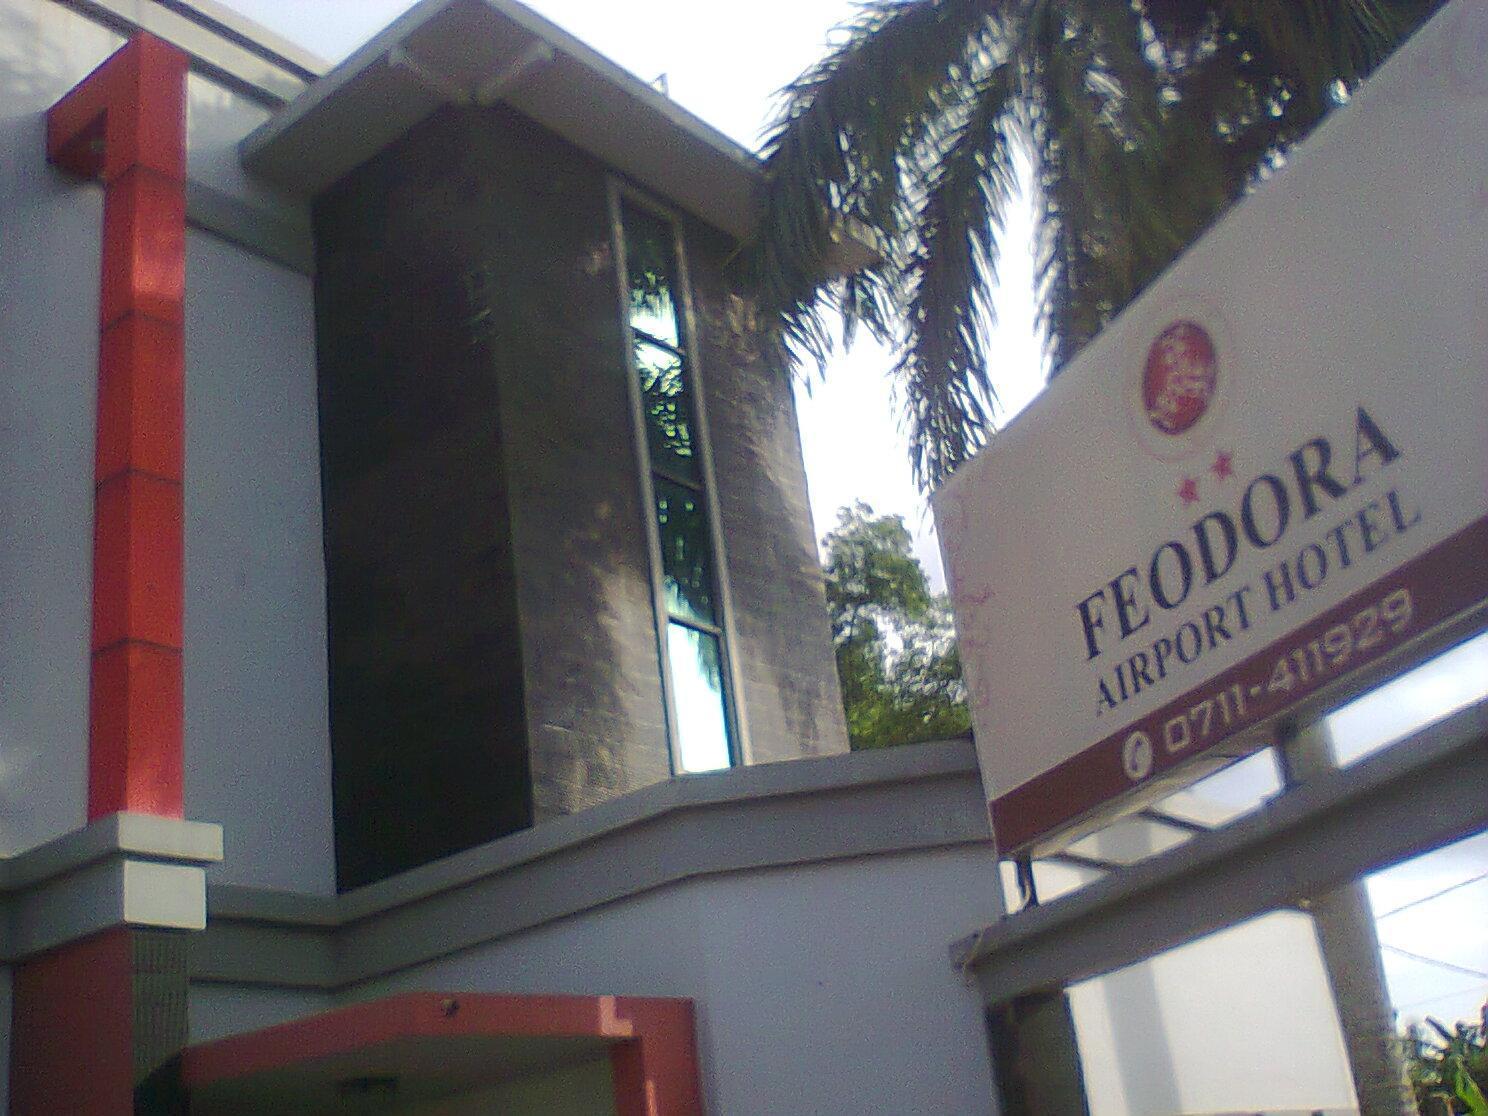 Hotell Belvena Feodora Hotel